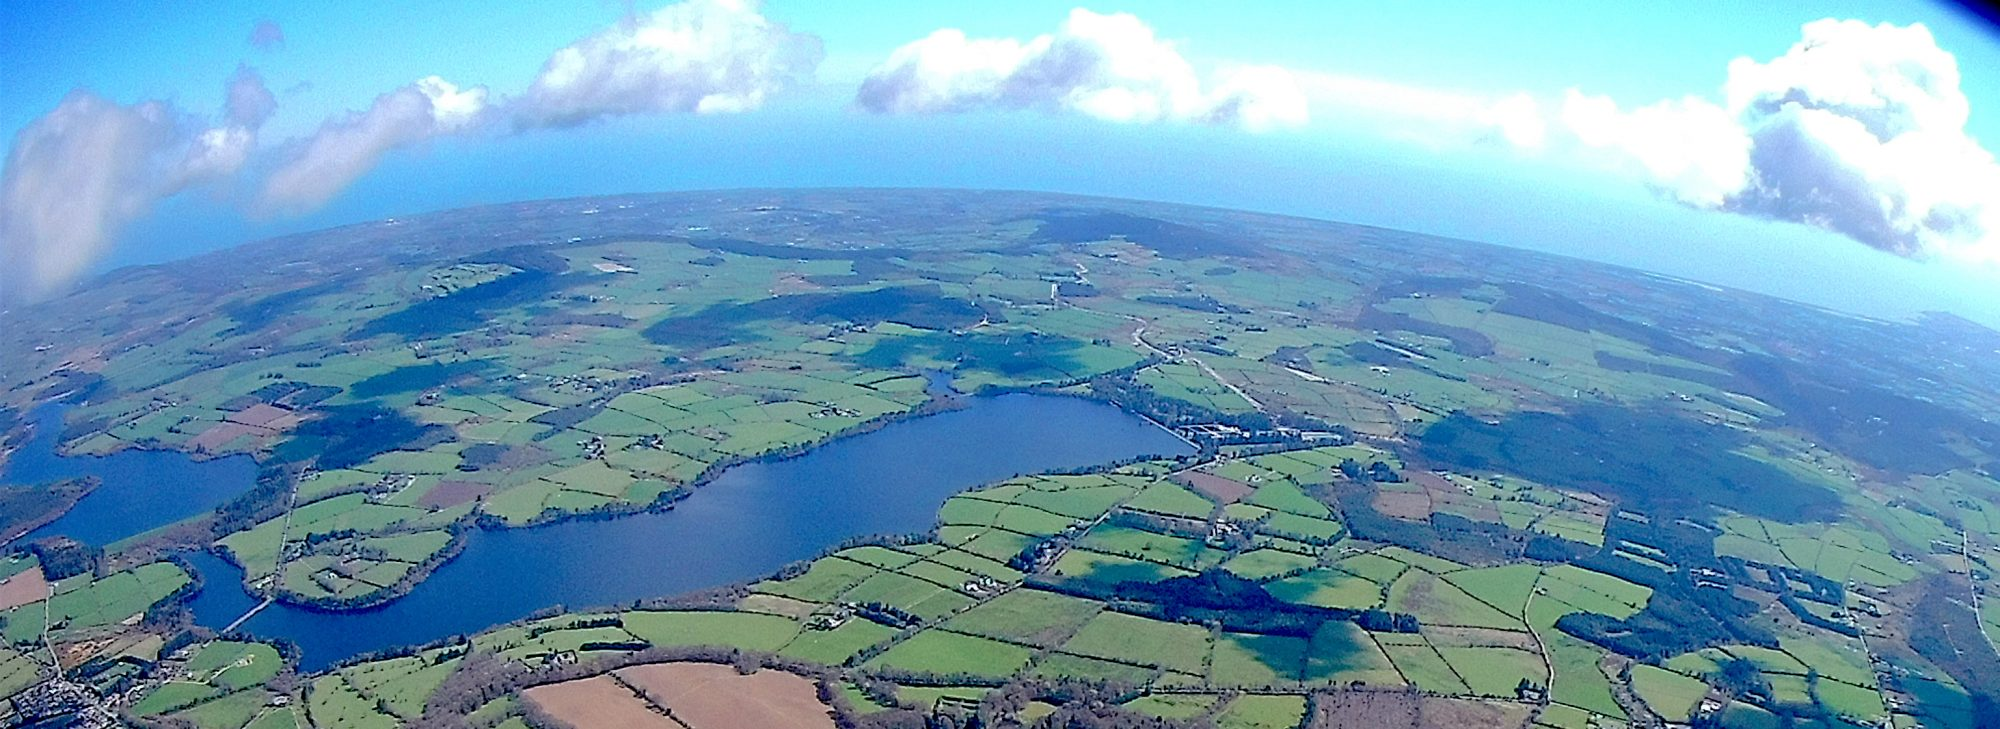 PARAGLIDING IRELAND